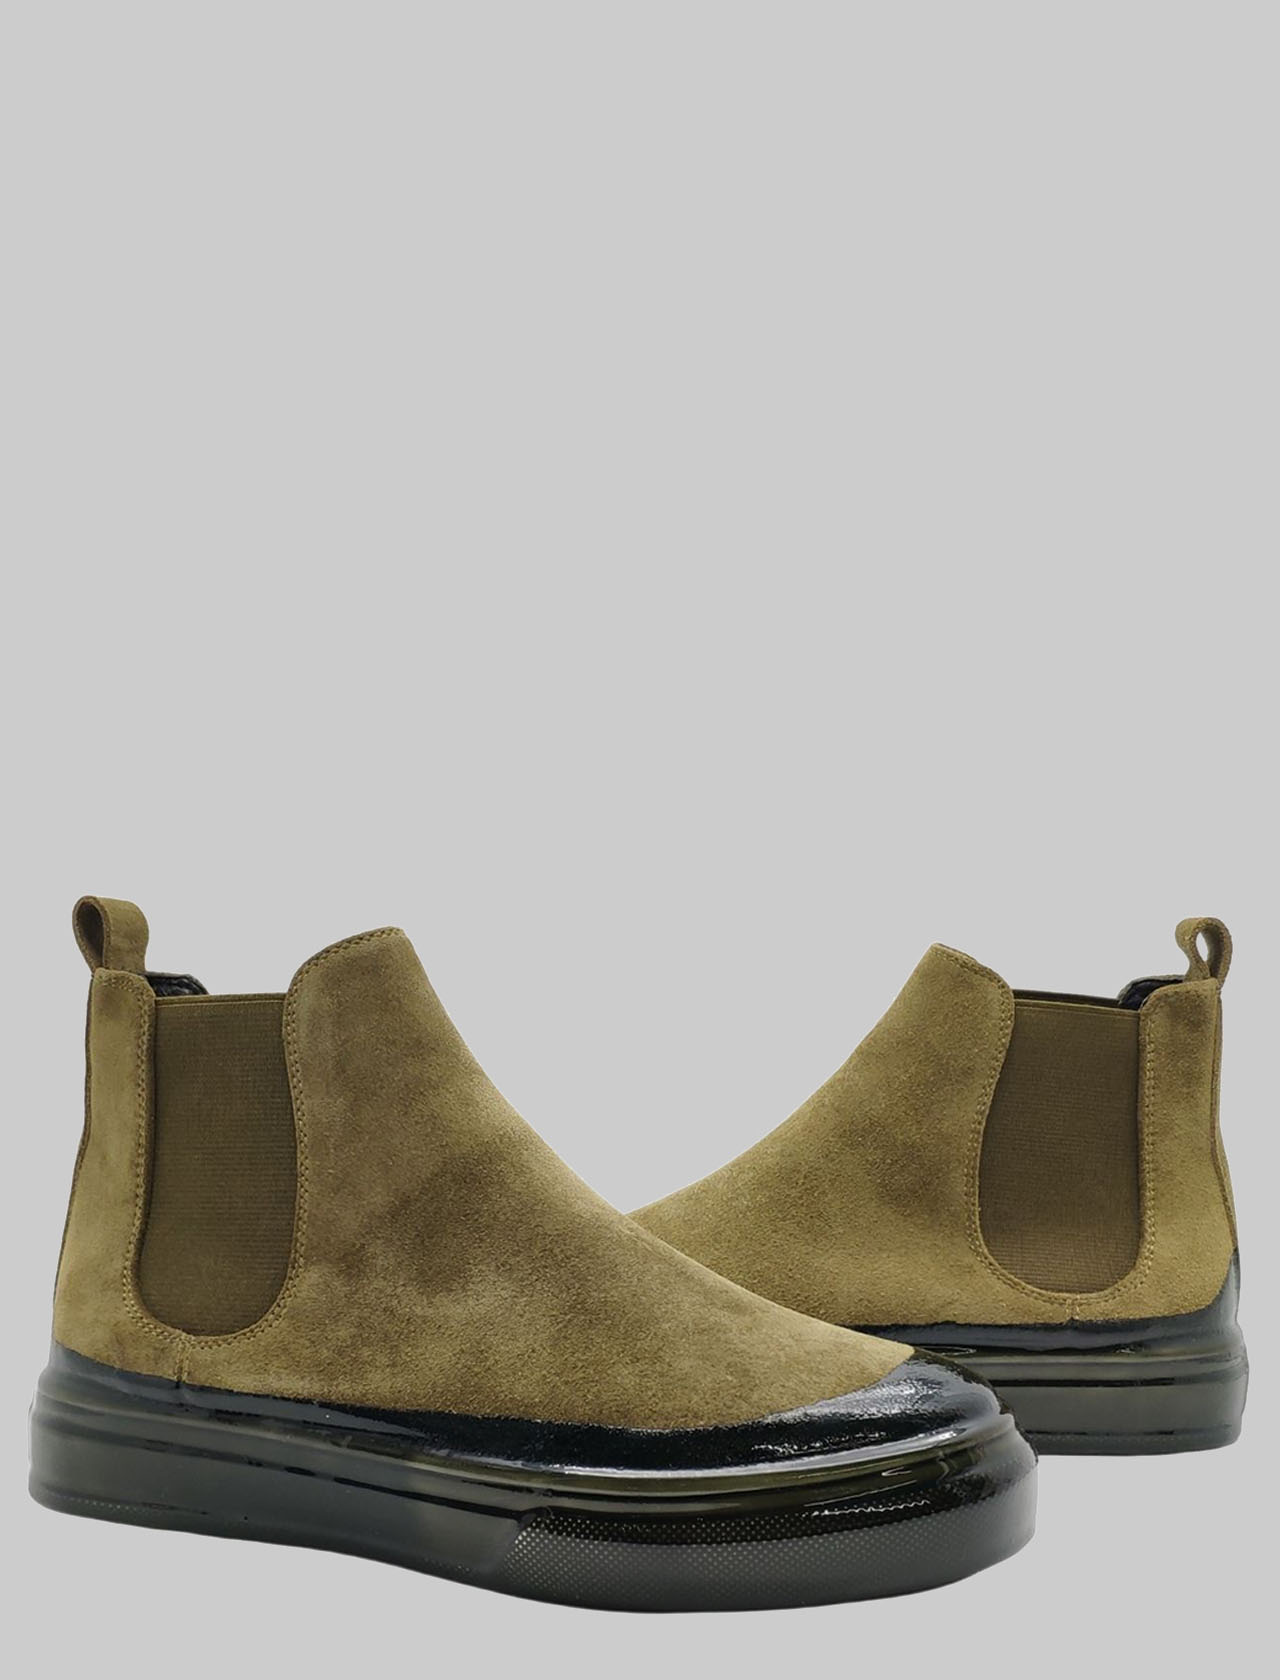 Calzature Donna Sneakers Beatles In Camoscio Muschio Fondo In Gomma Verde Scuro Manufacture D'Essai | Sneakers | MDE69VERDE